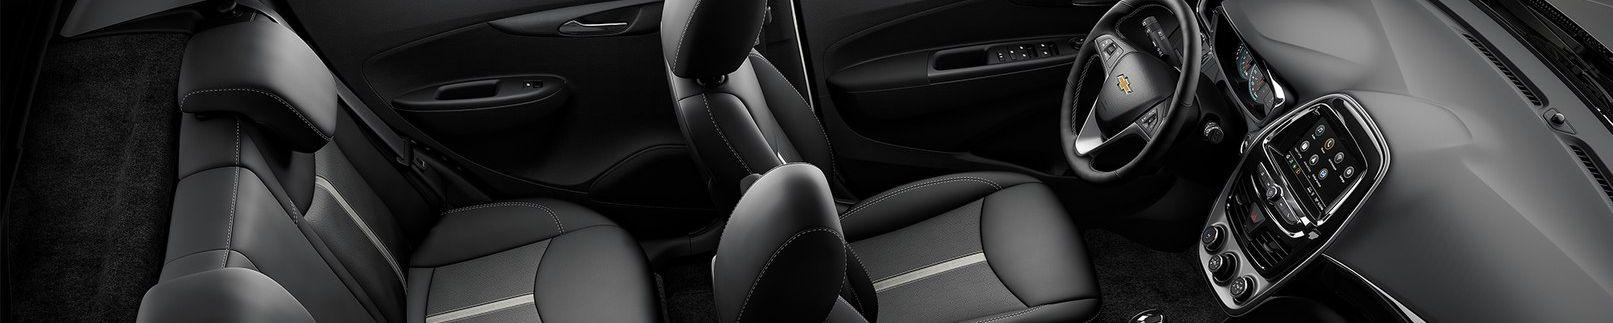 2019 Chevrolet Spark Interior